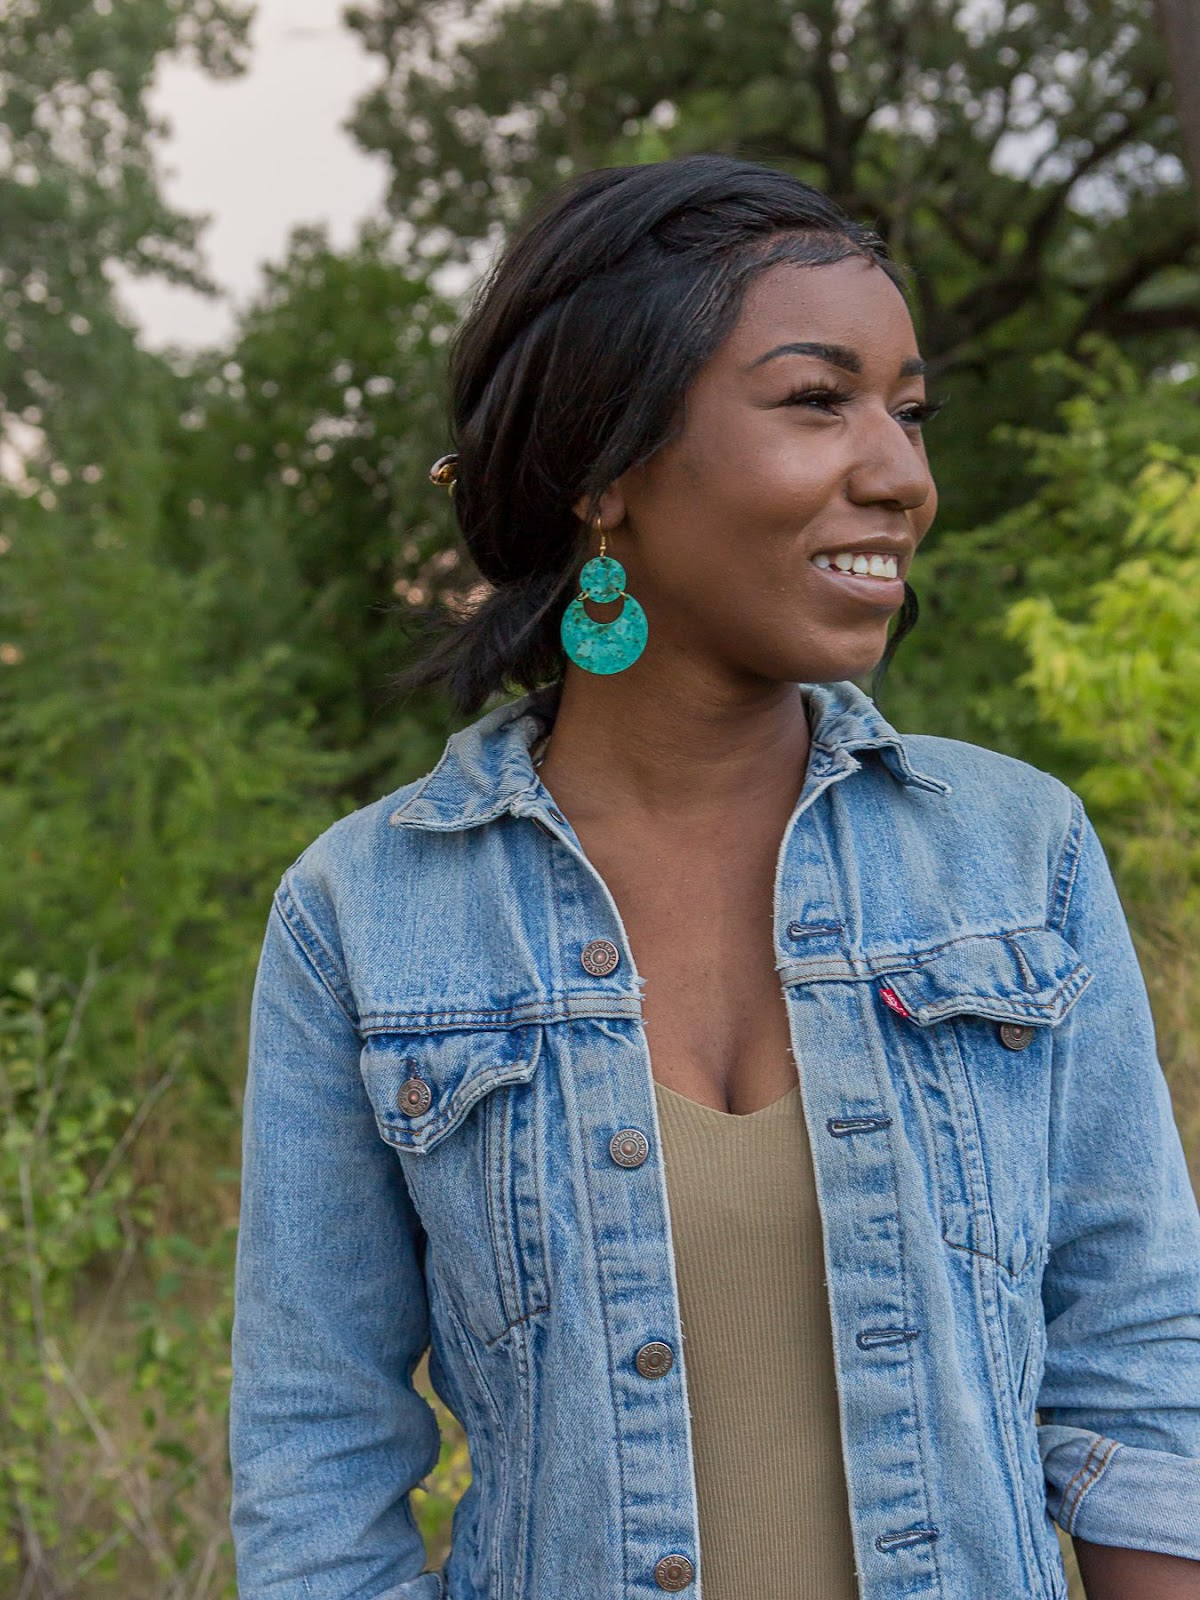 Turquoise Sustainable Earrings